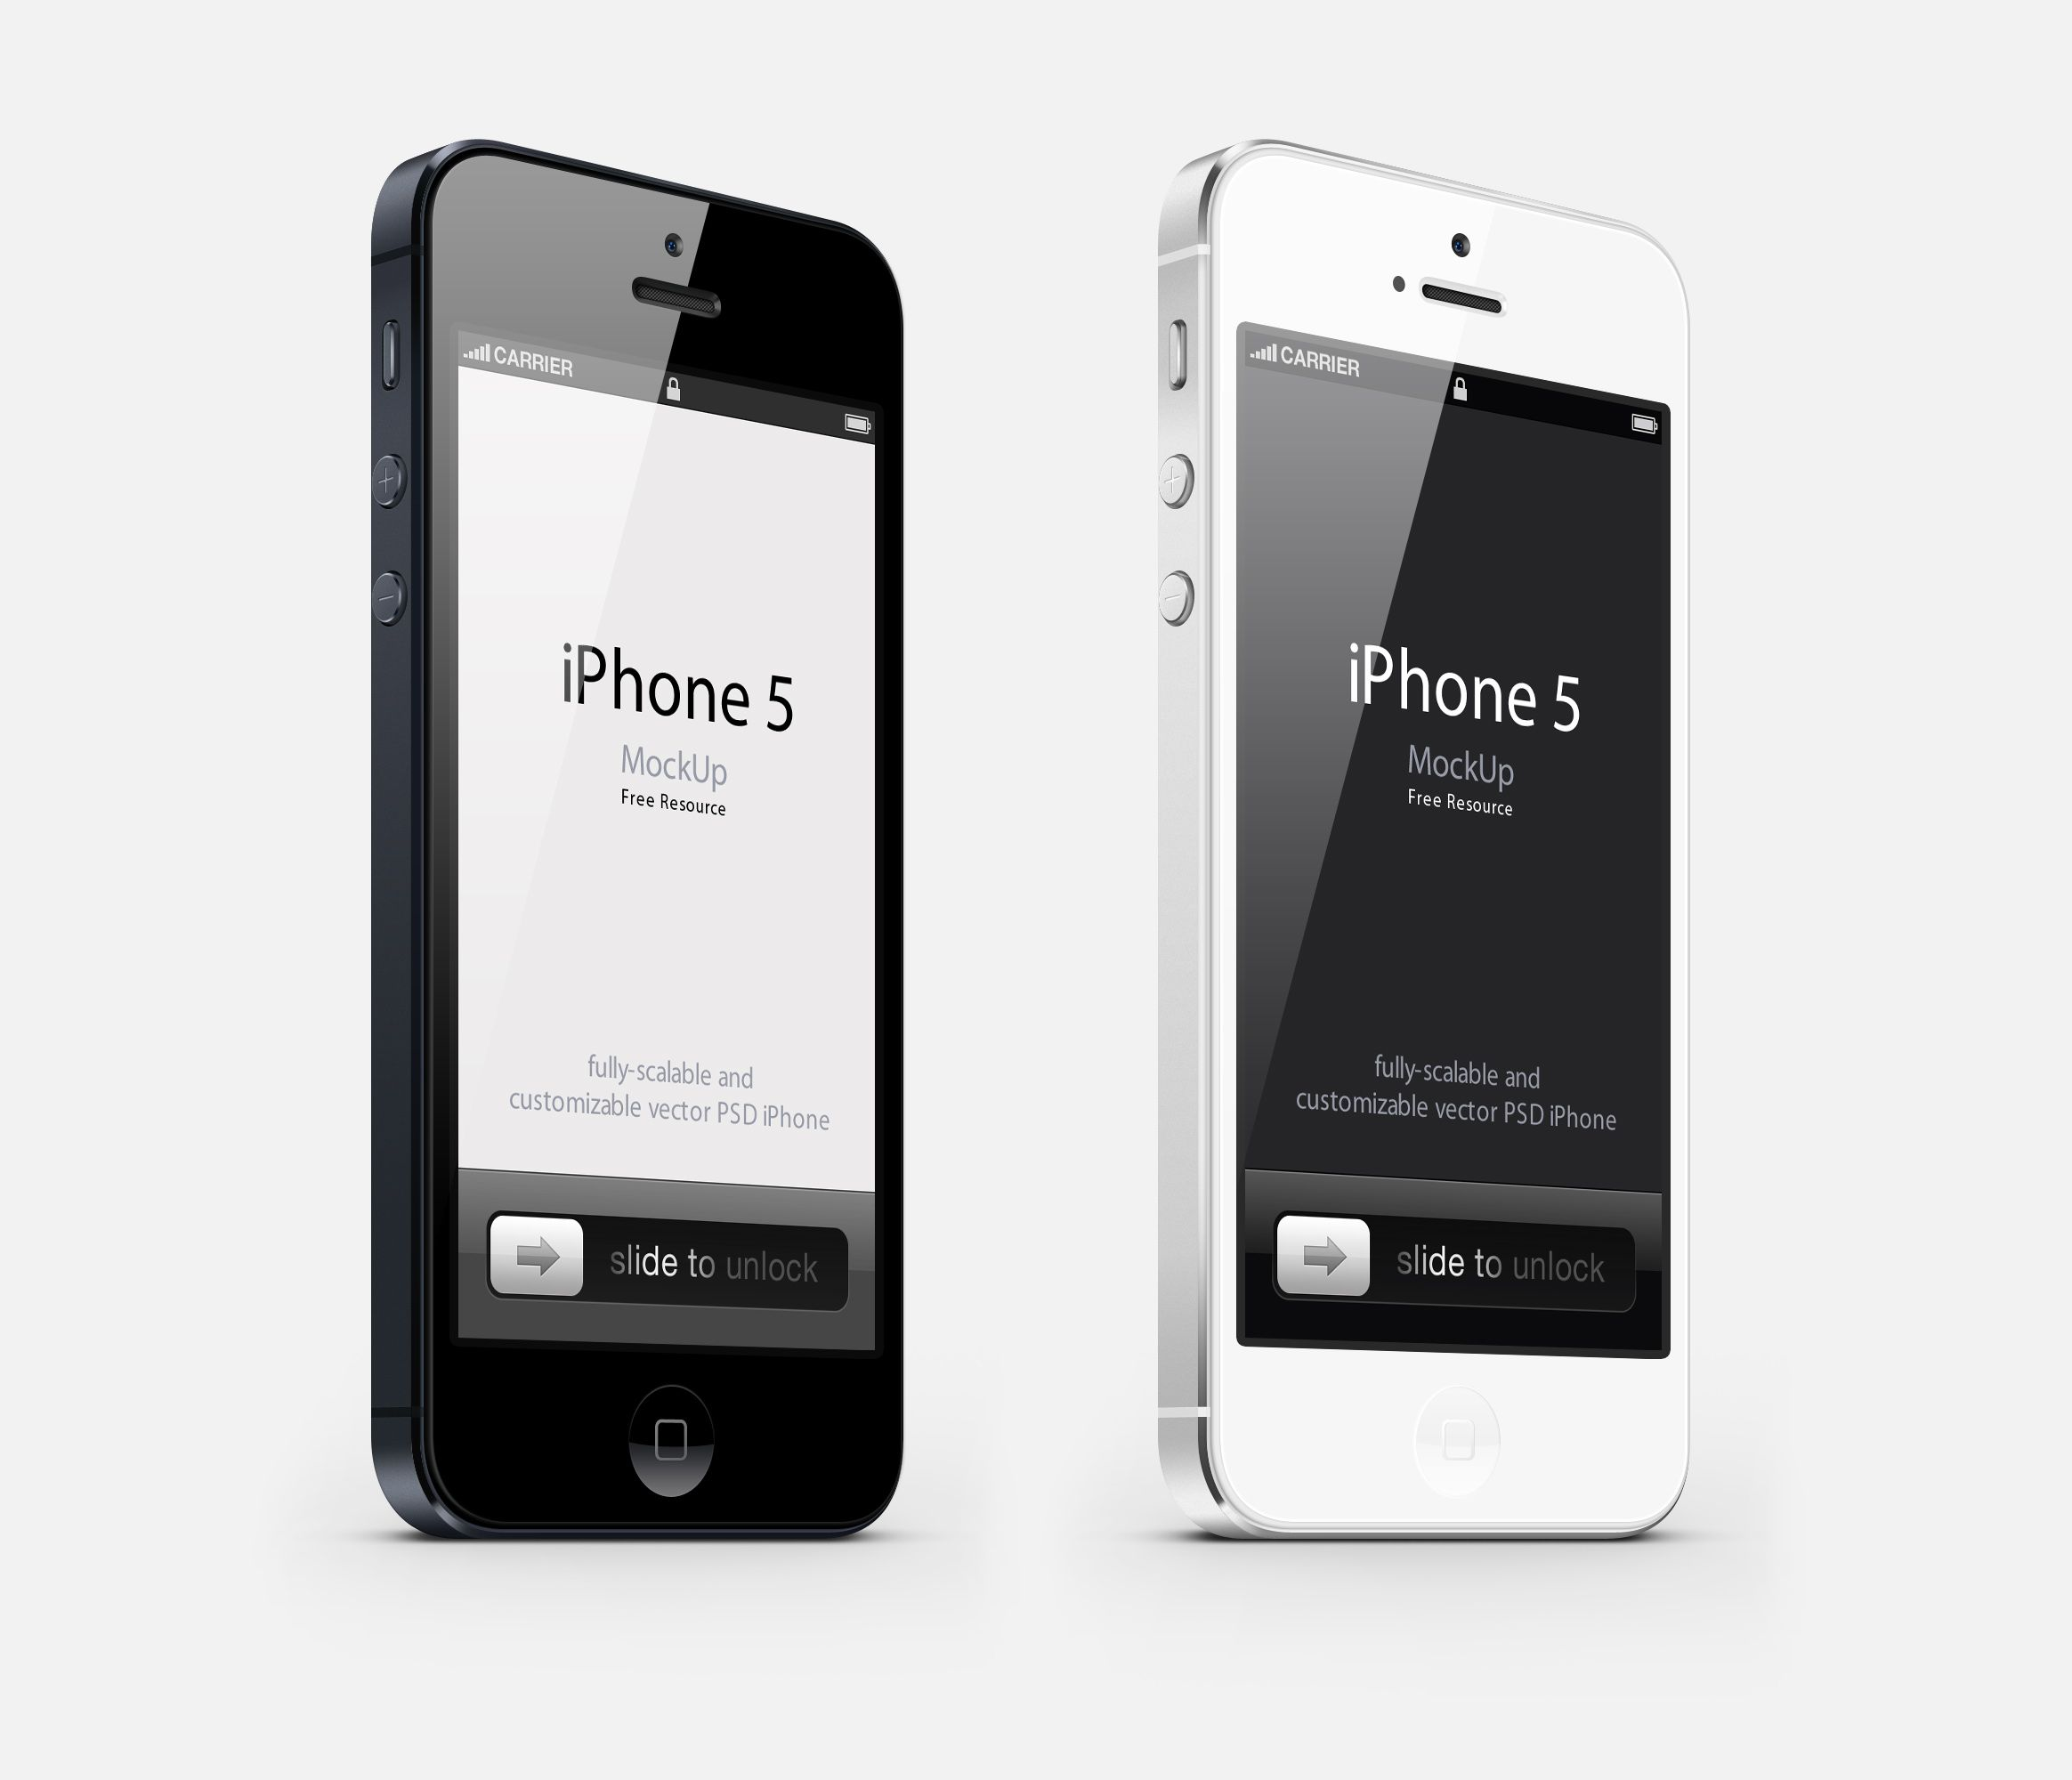 Iphone 5 3 4 View Mockup Iphone Psd Iphone Mockup Free Iphone